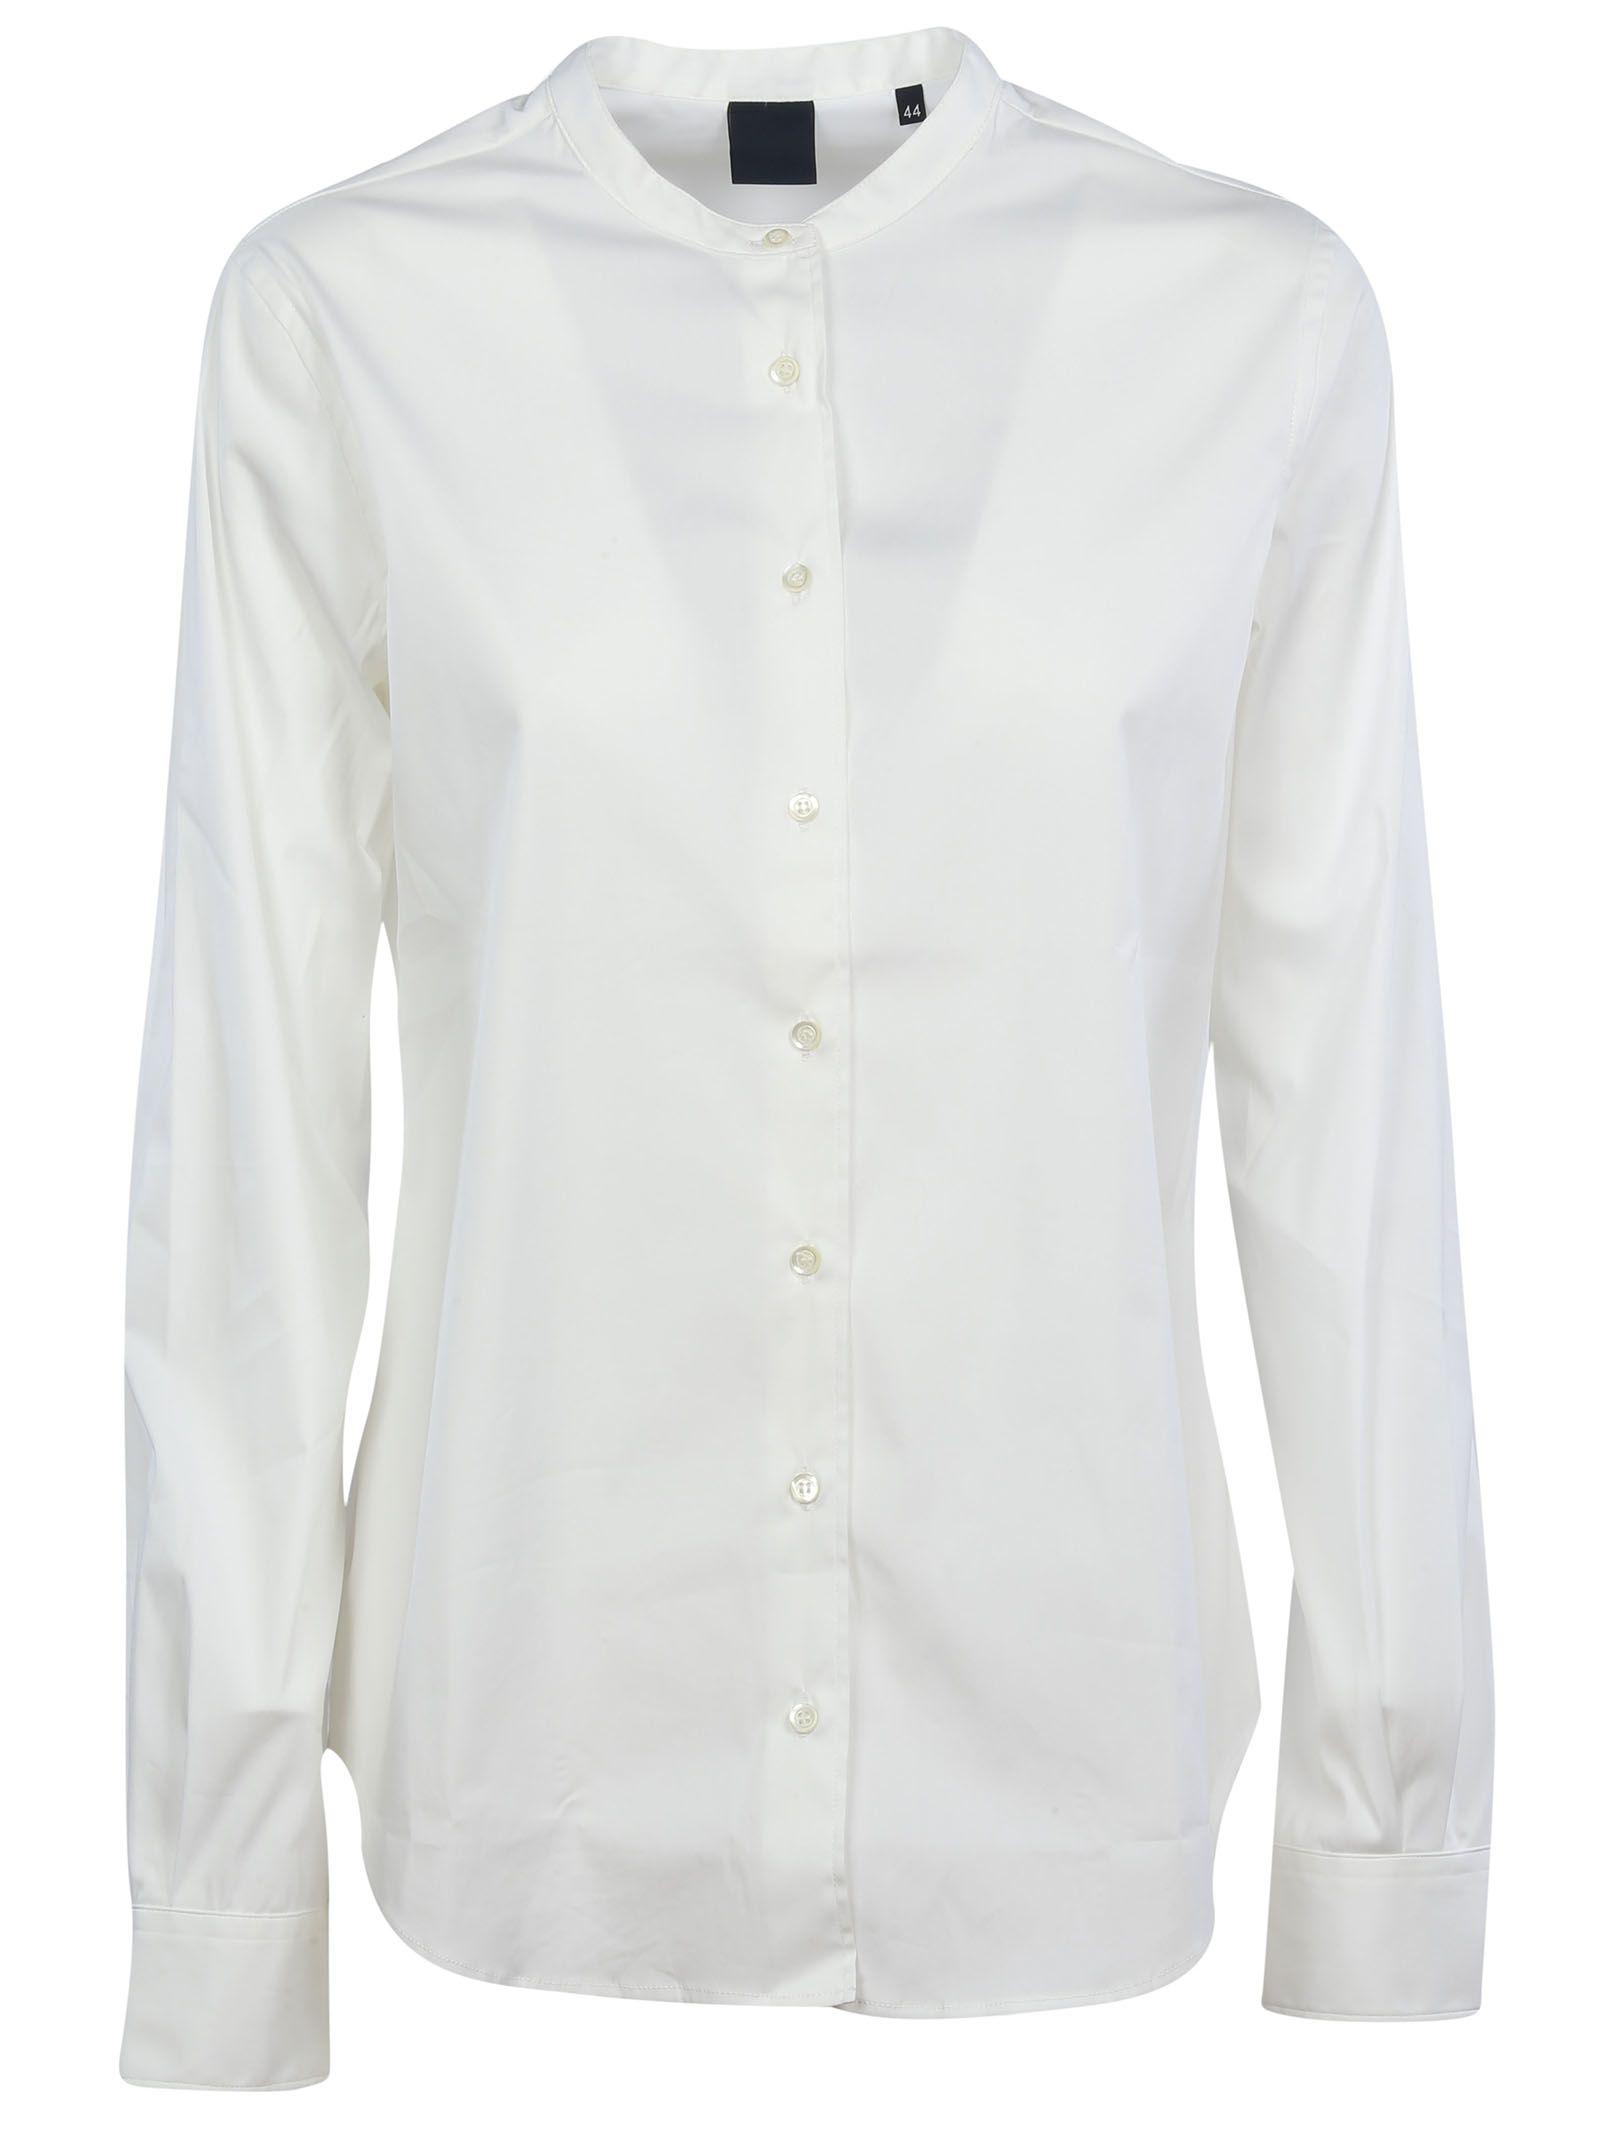 Aspesi Aspesi Collarless Shirt White 3728012 Italist